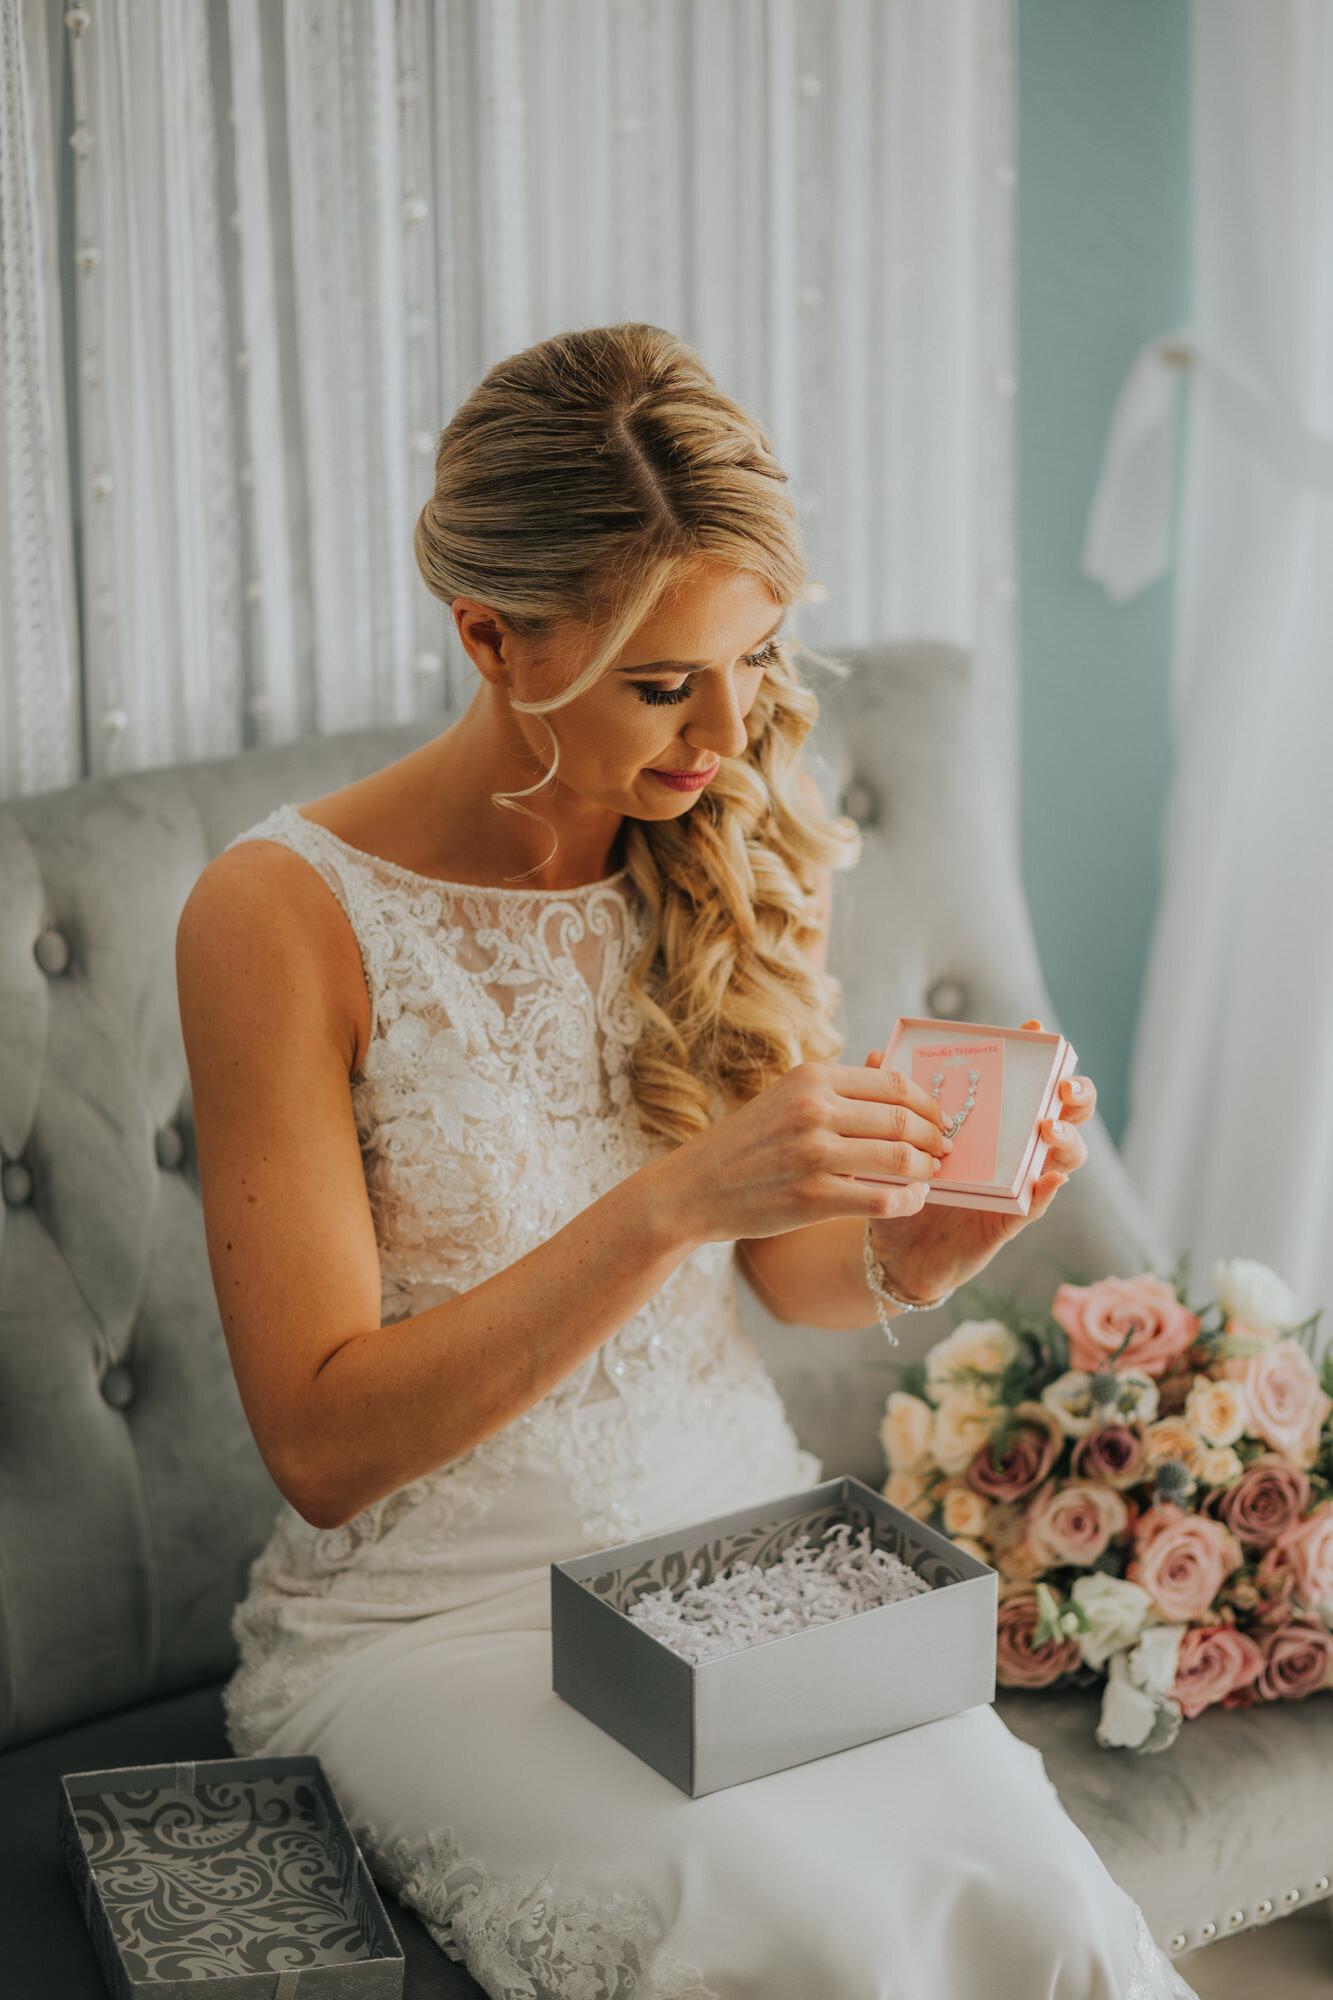 066Sean_Emily_Wedding_3-30-19.jpg